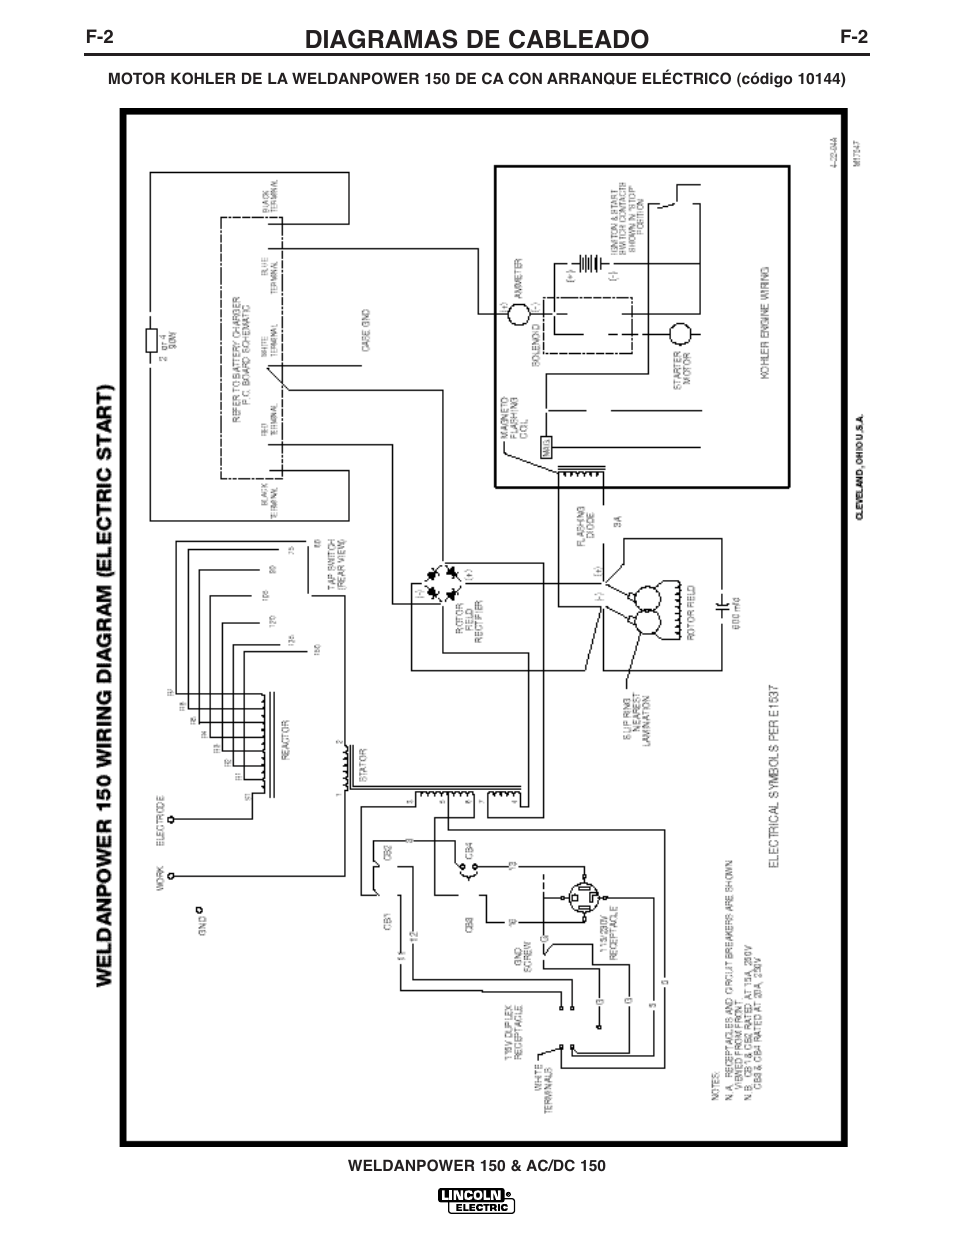 medium resolution of diagramas de cableado lincoln electric im413 weldanpower 150 user manual page 18 30